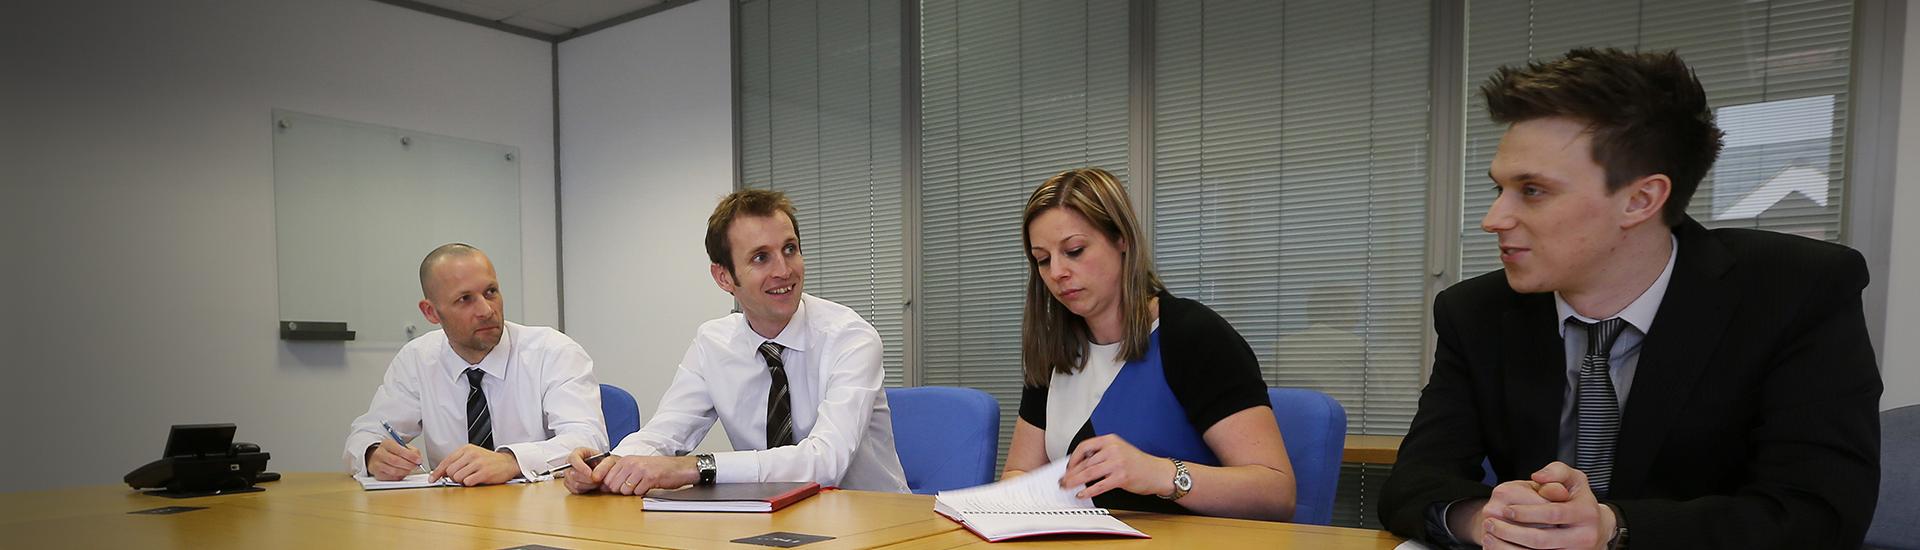 NSC Staff in boardroom